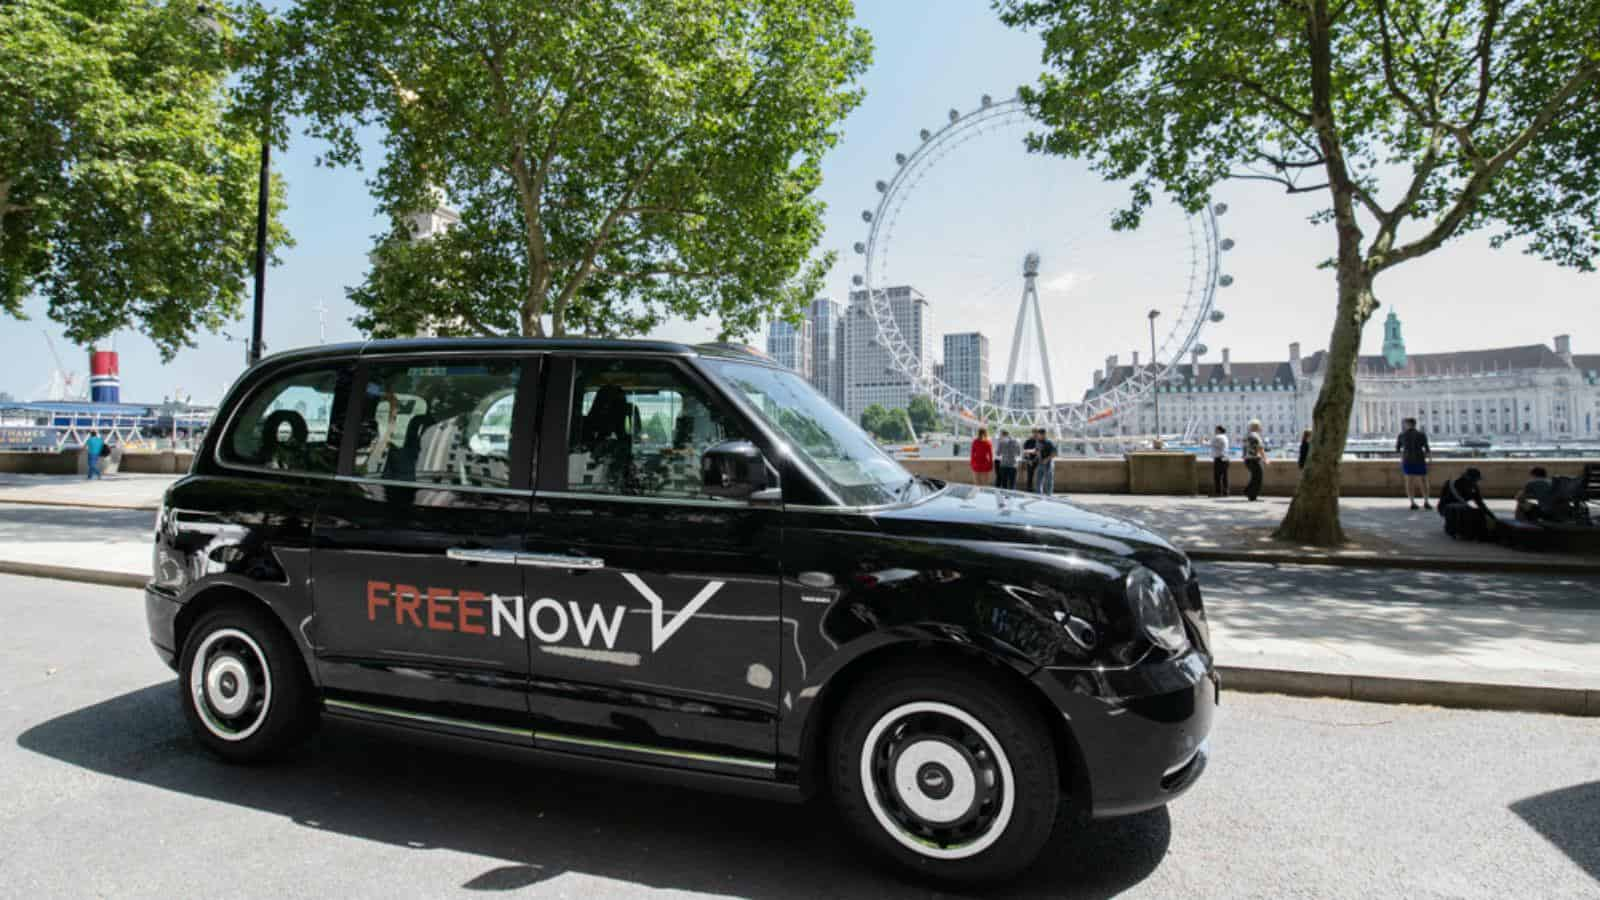 Uber Freenow